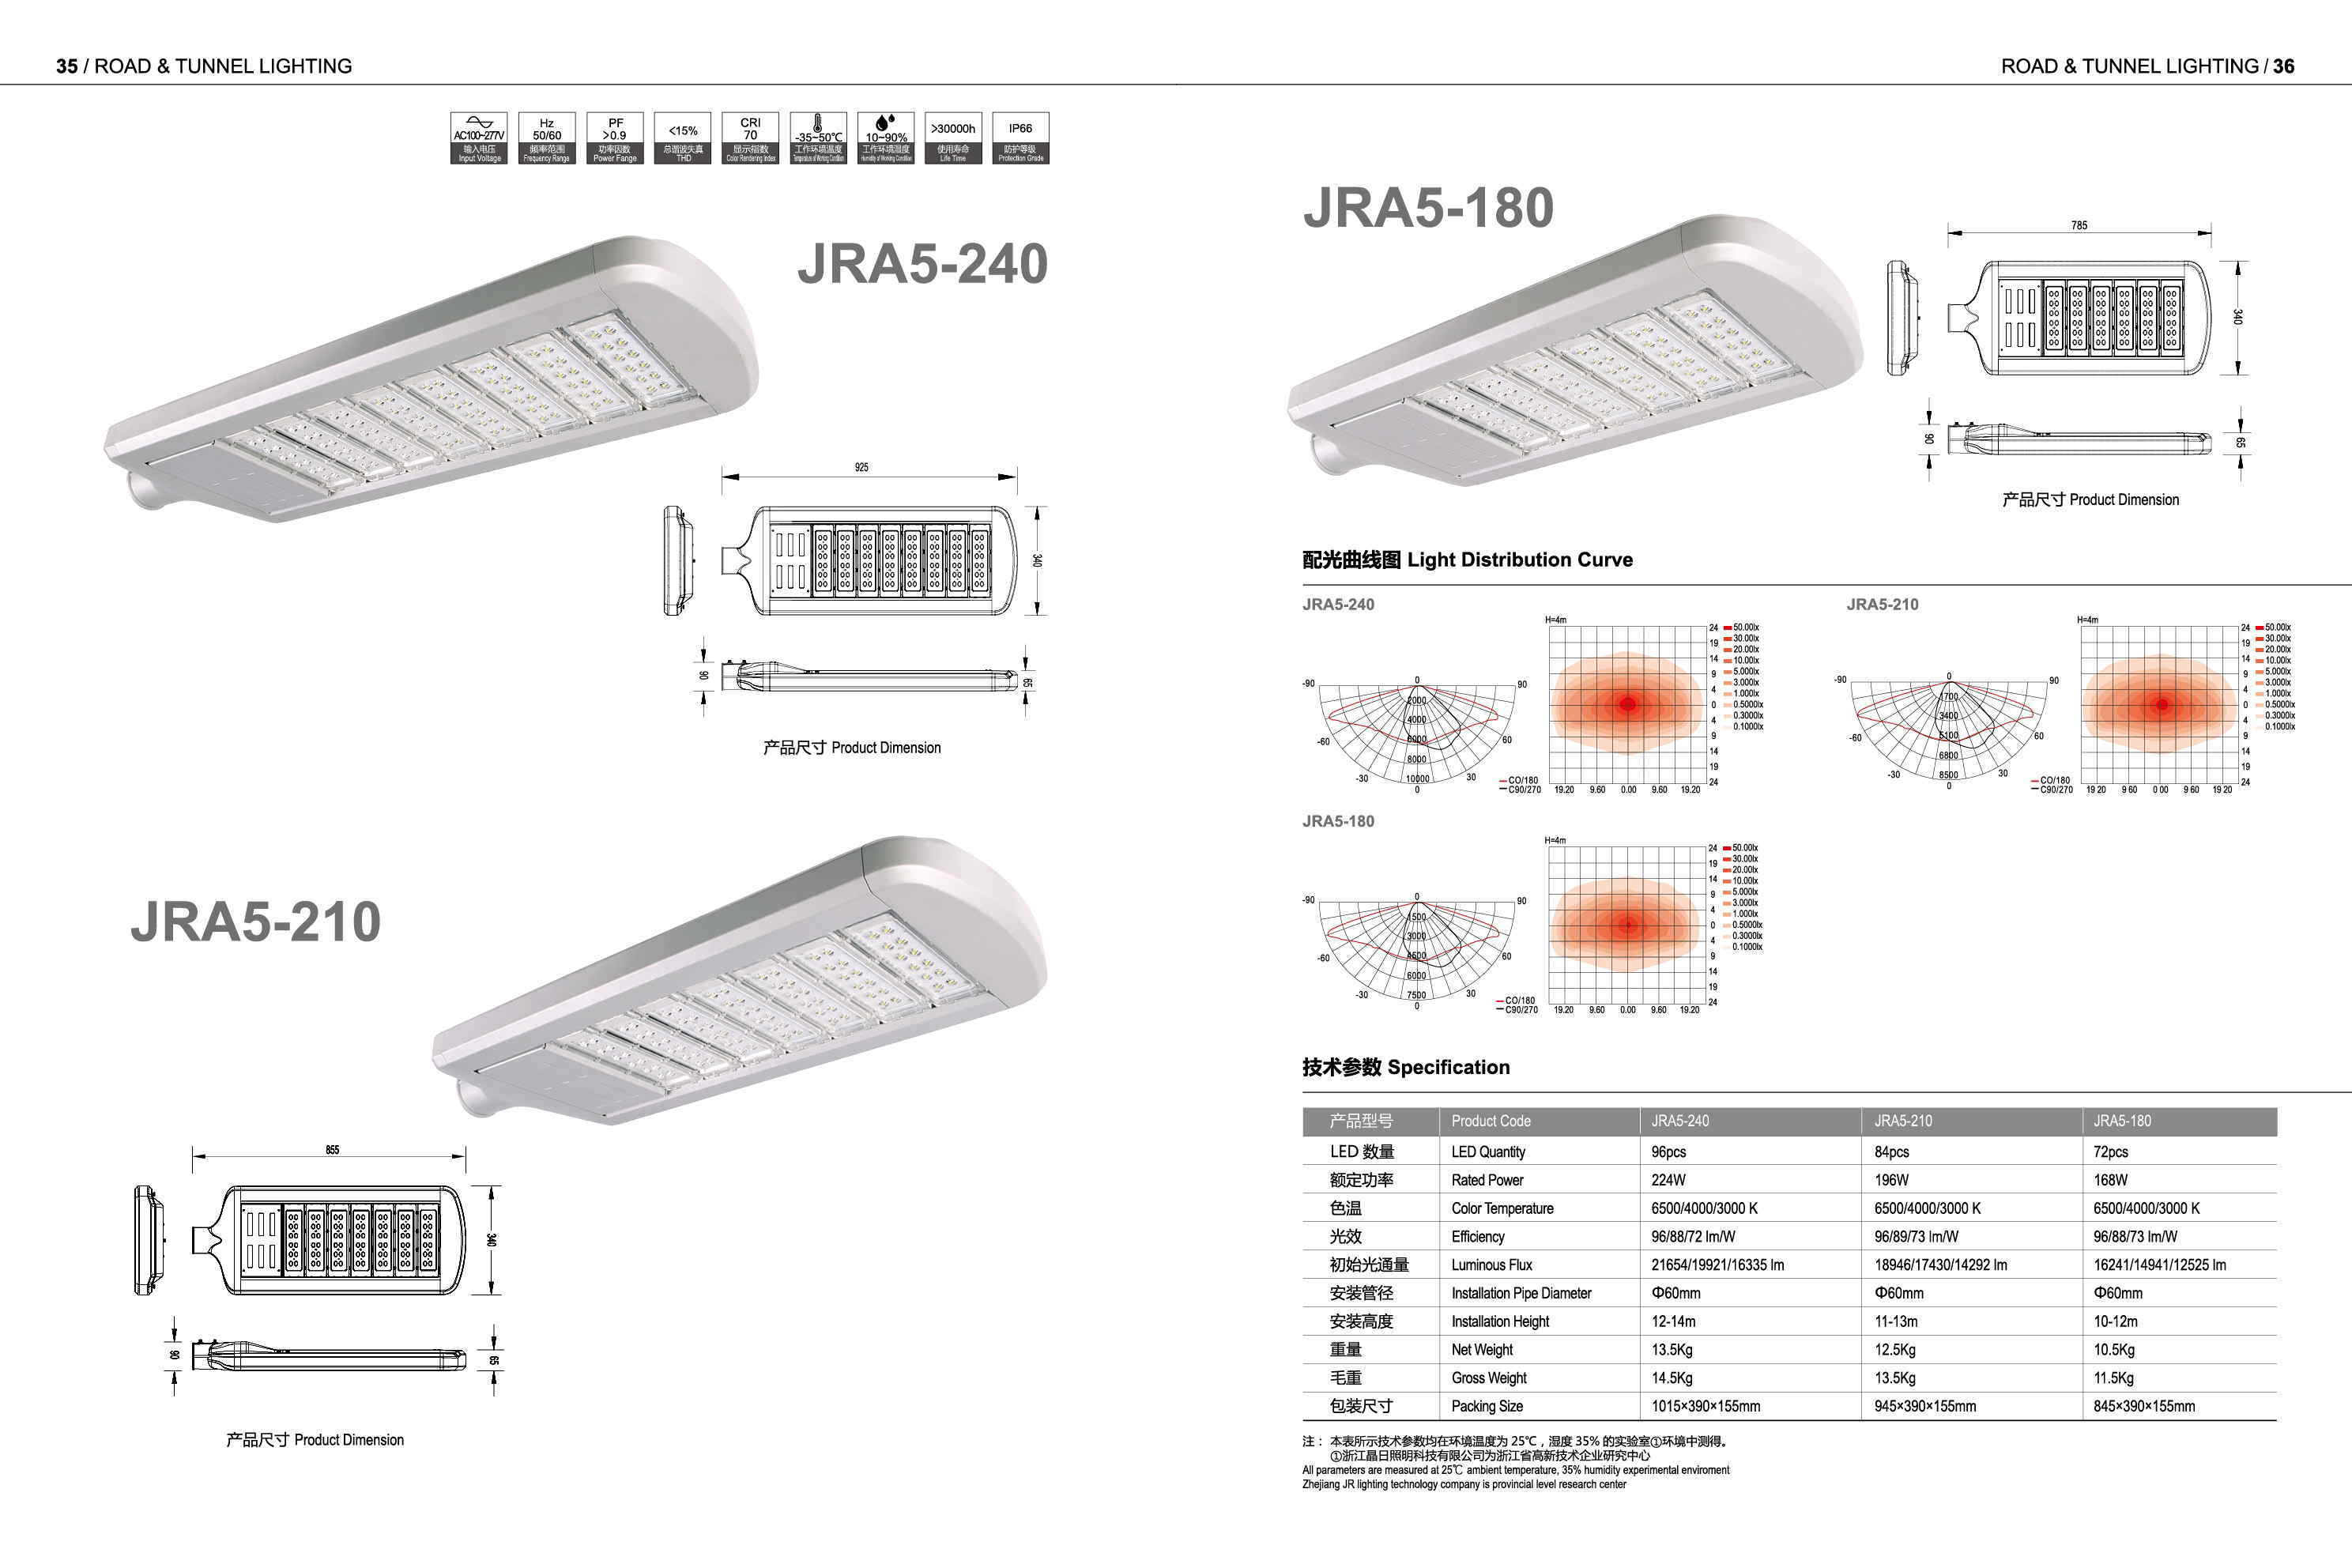 China Led Street Light Jra5 210 Tunnel Lighting Diagram